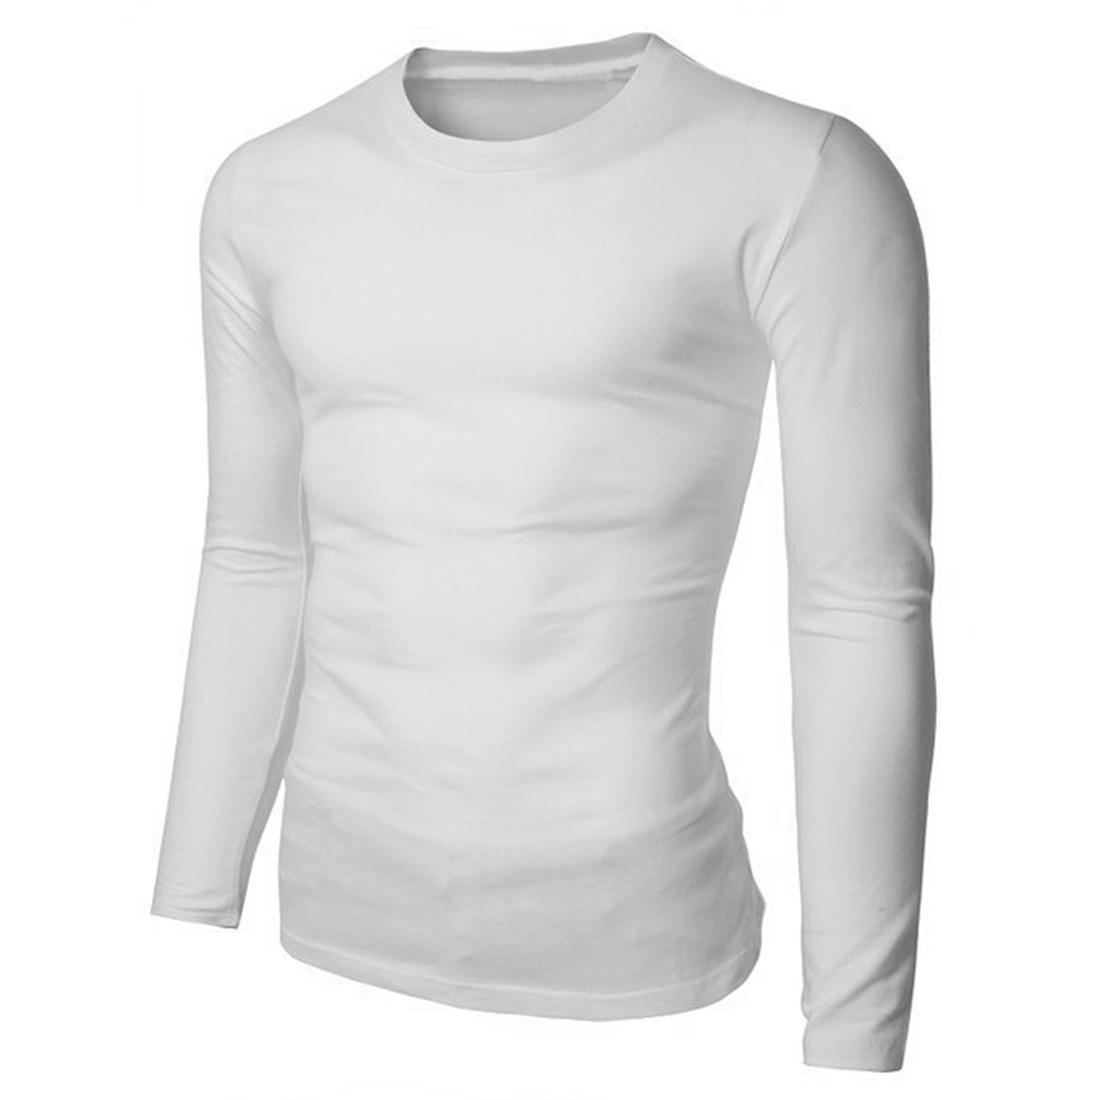 100 cotton mens slim basic tee t shirt long sleeve v neck for Mens long sleeve casual cotton shirts